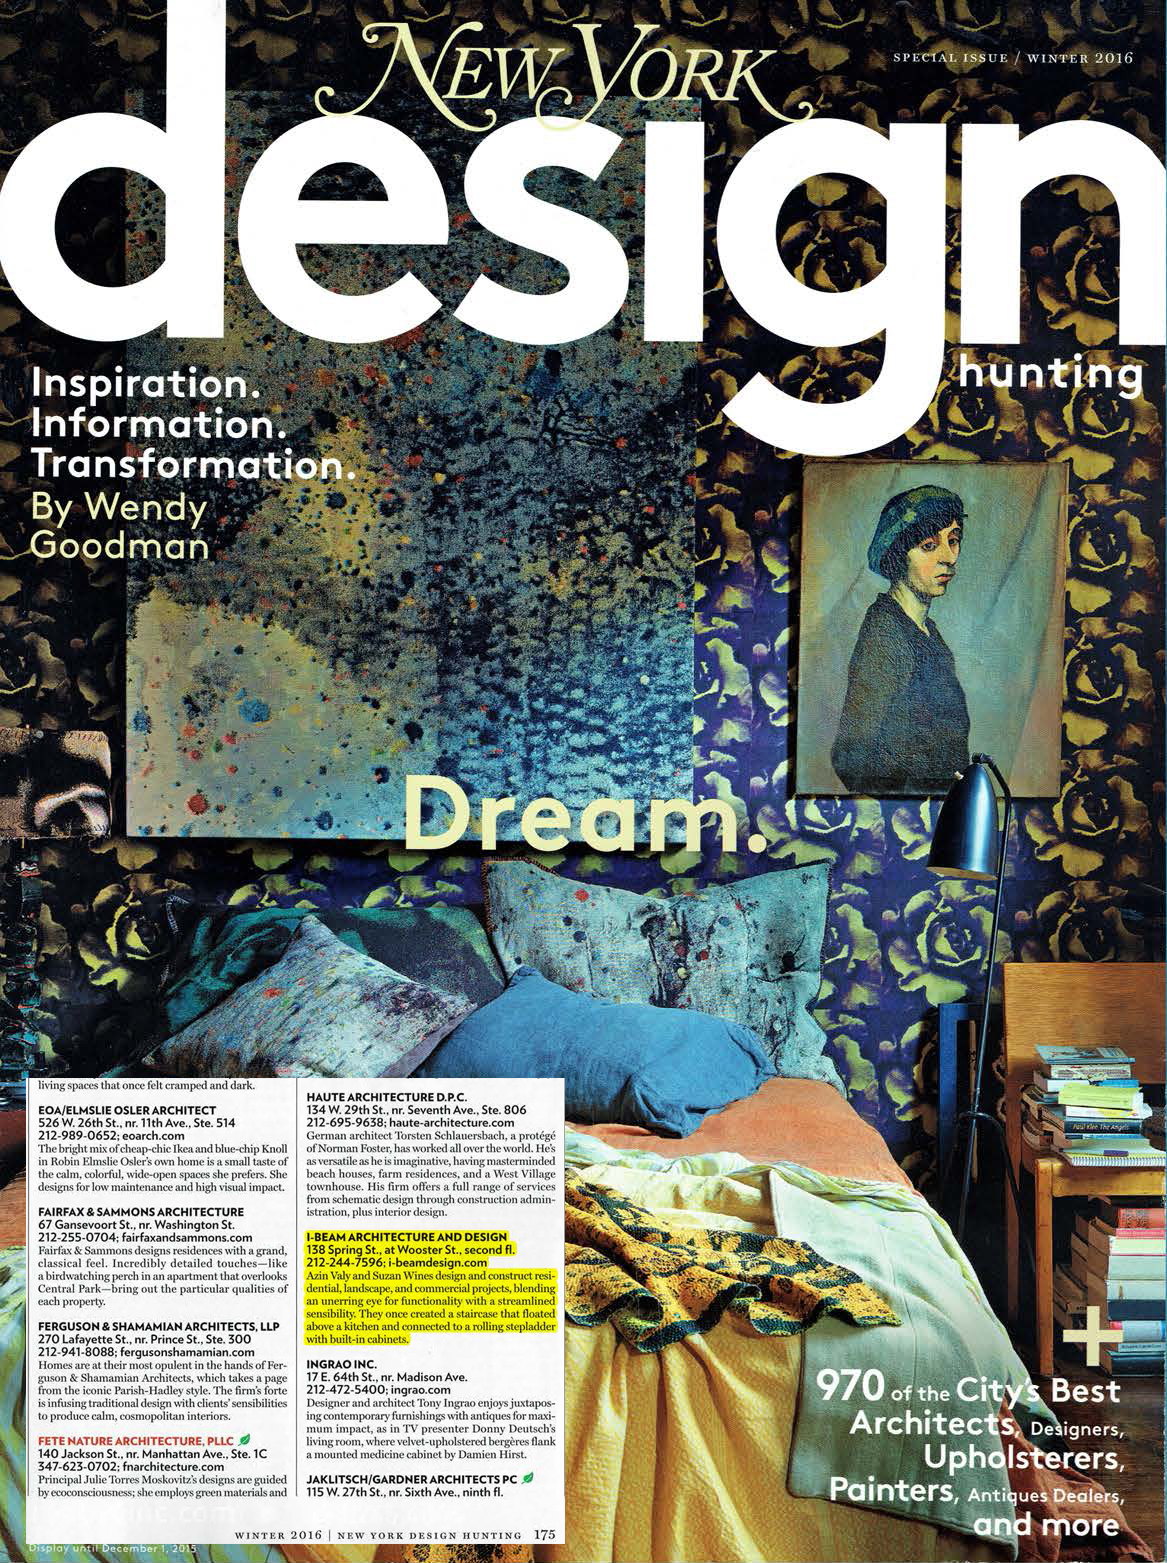 New York Magazine Cover, Design Issue Sep 2015 final.jpg